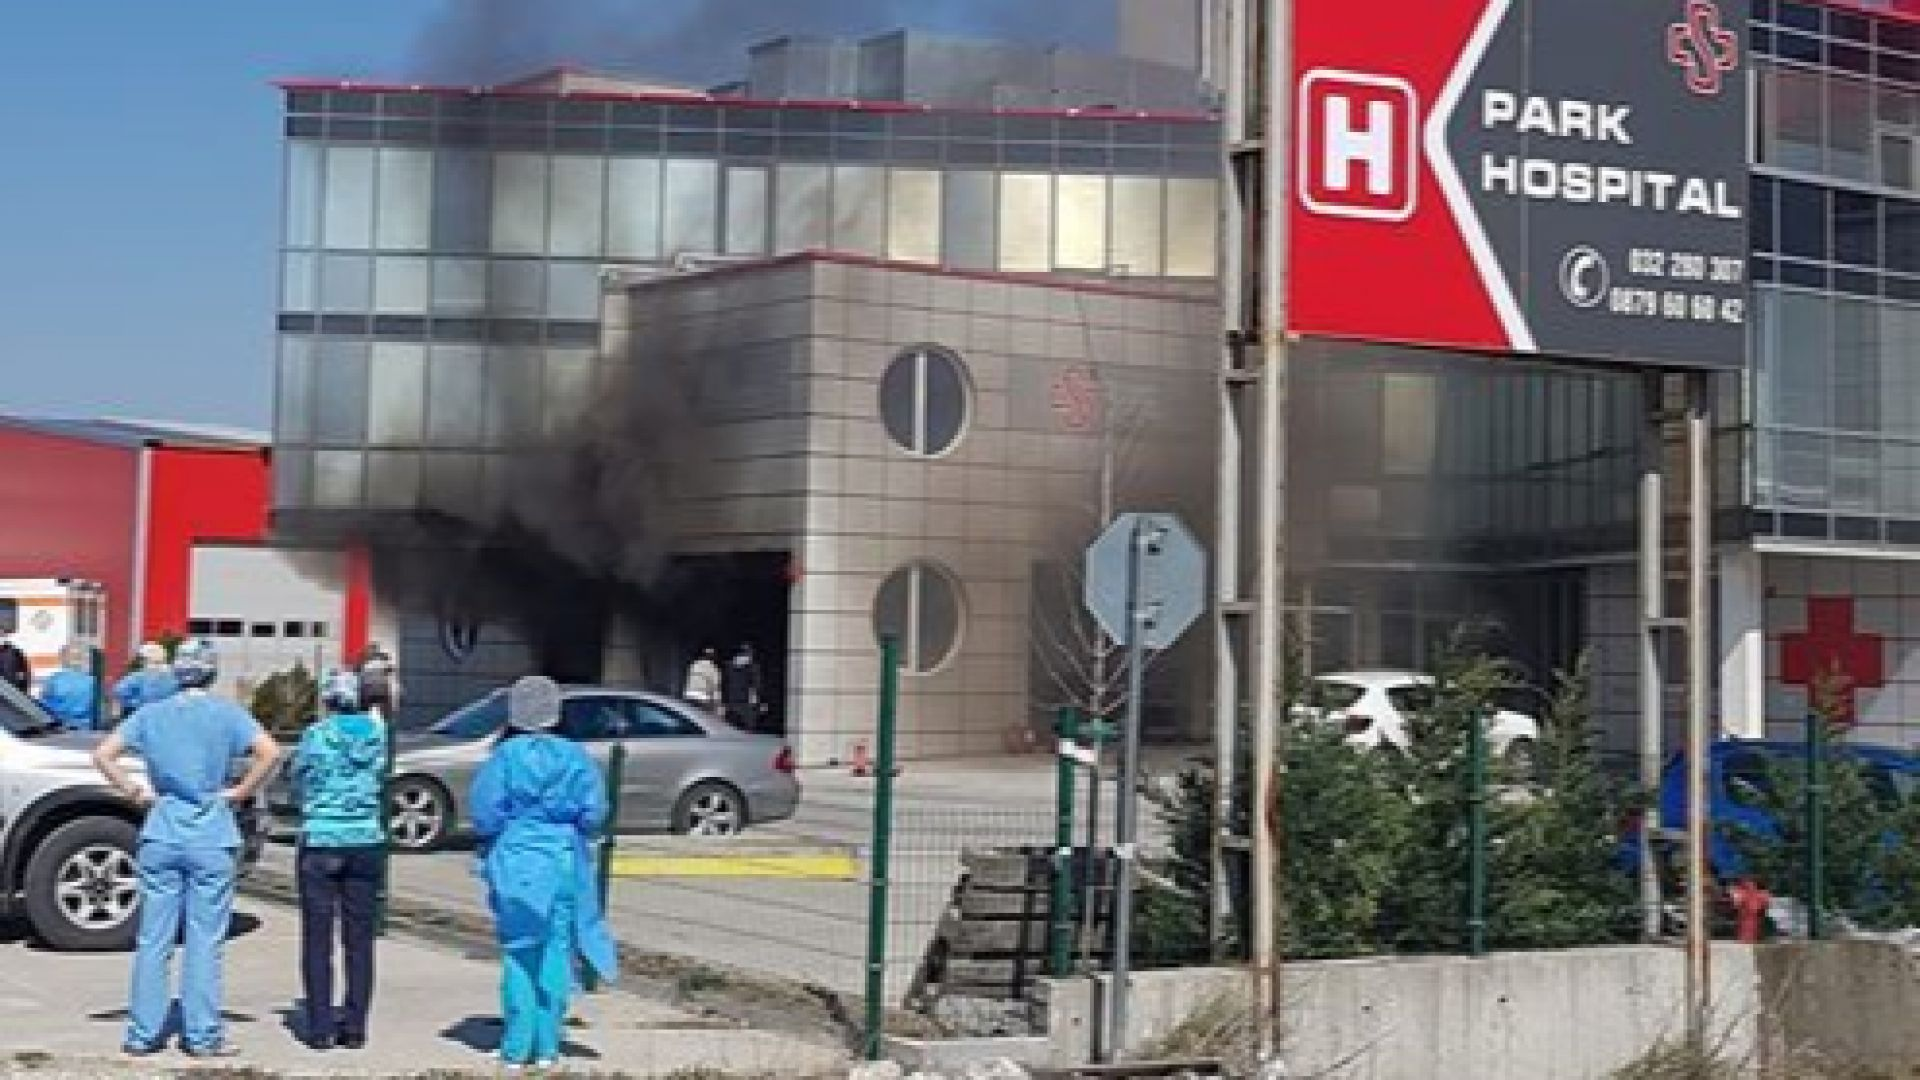 Спасиха десетки пациенти при пожар в пловдивска болница (снимки/видео)